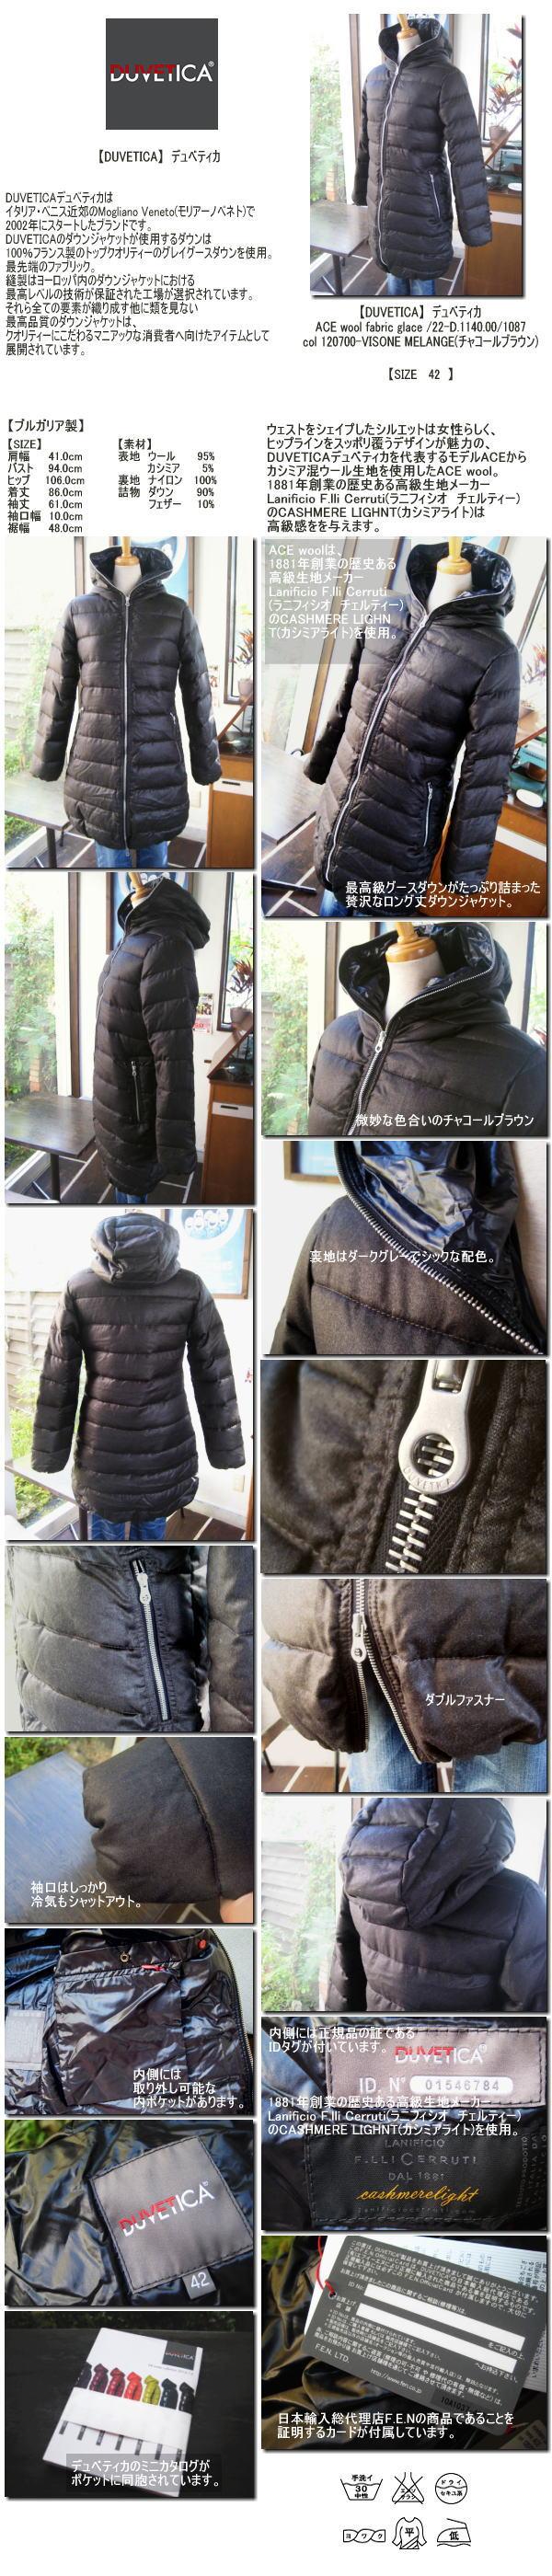 【DUVETICA】 デュベティカ ACE  wool fabric glace /22-D.1140.00/1087 col 120700-VISONE MELANGE(チャコールブラウン)